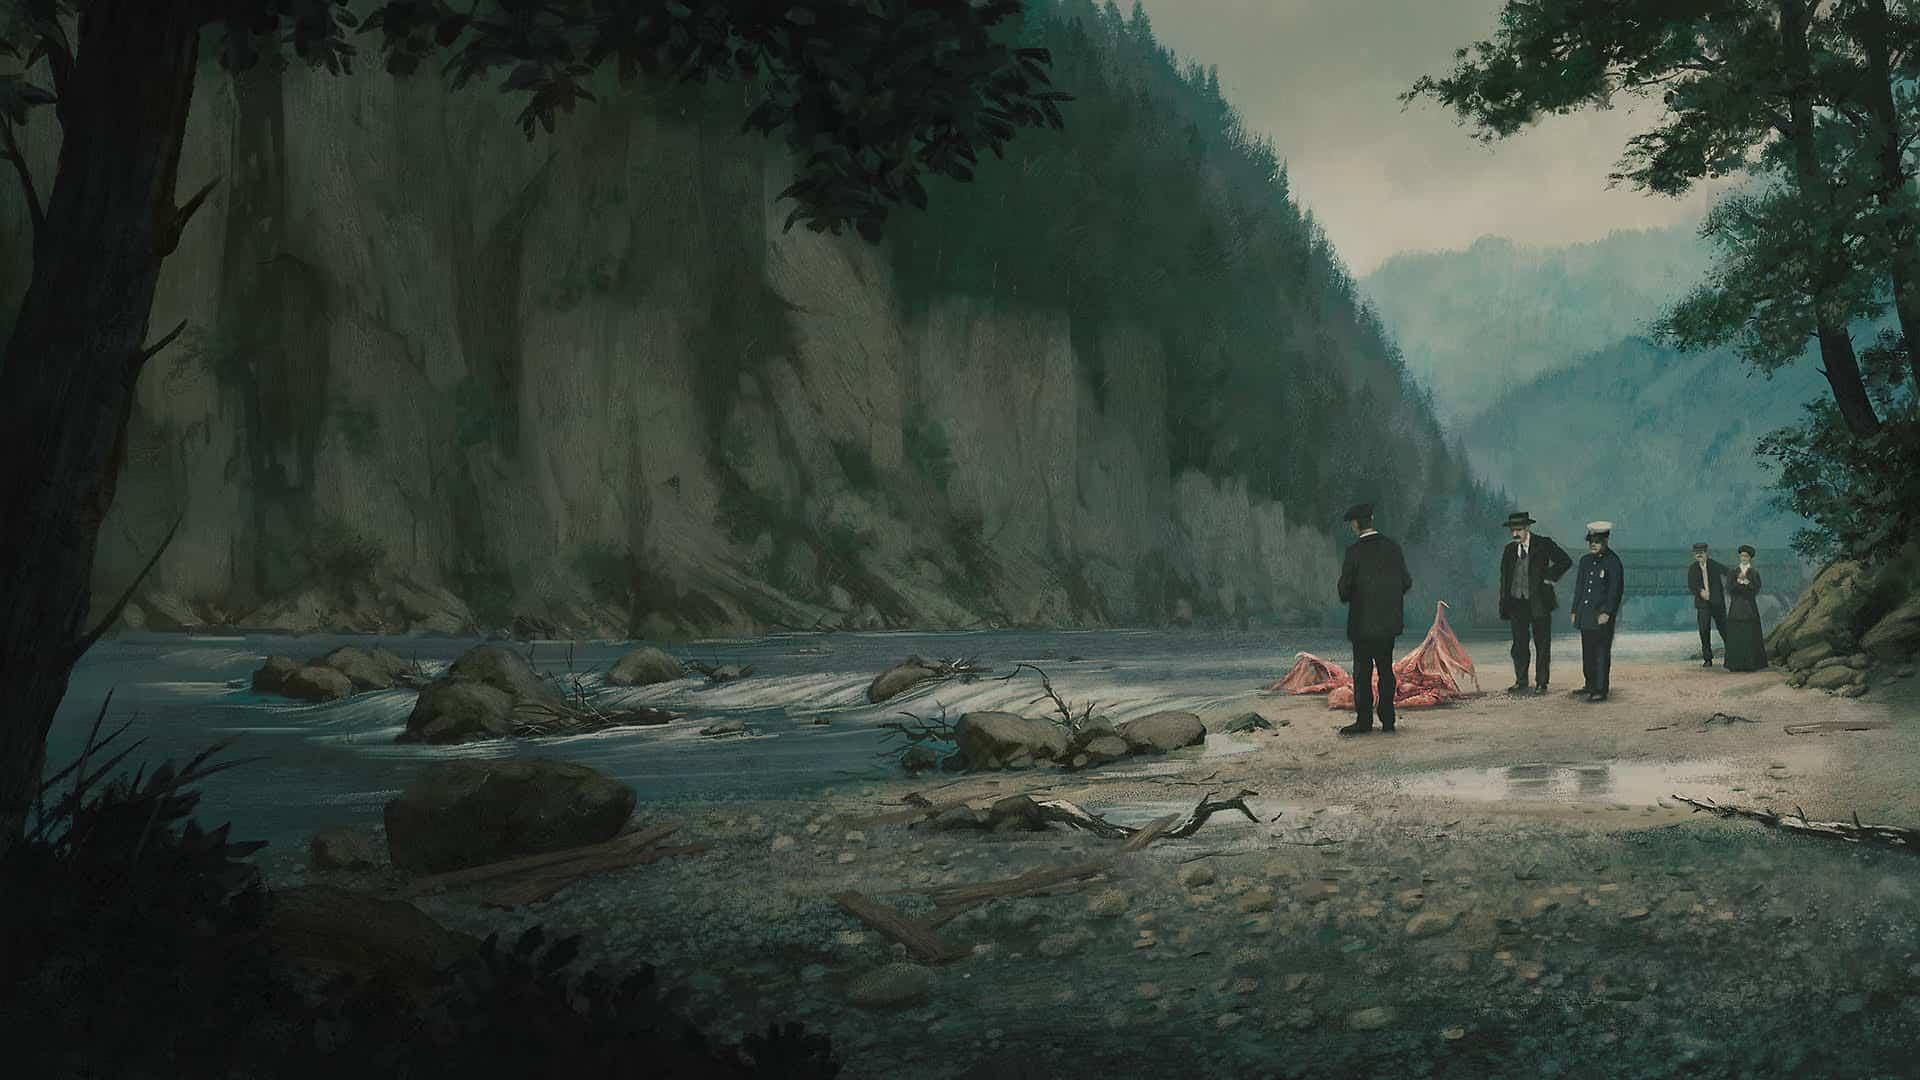 After the Flood - Digital Painting by Valentin Kopetzki